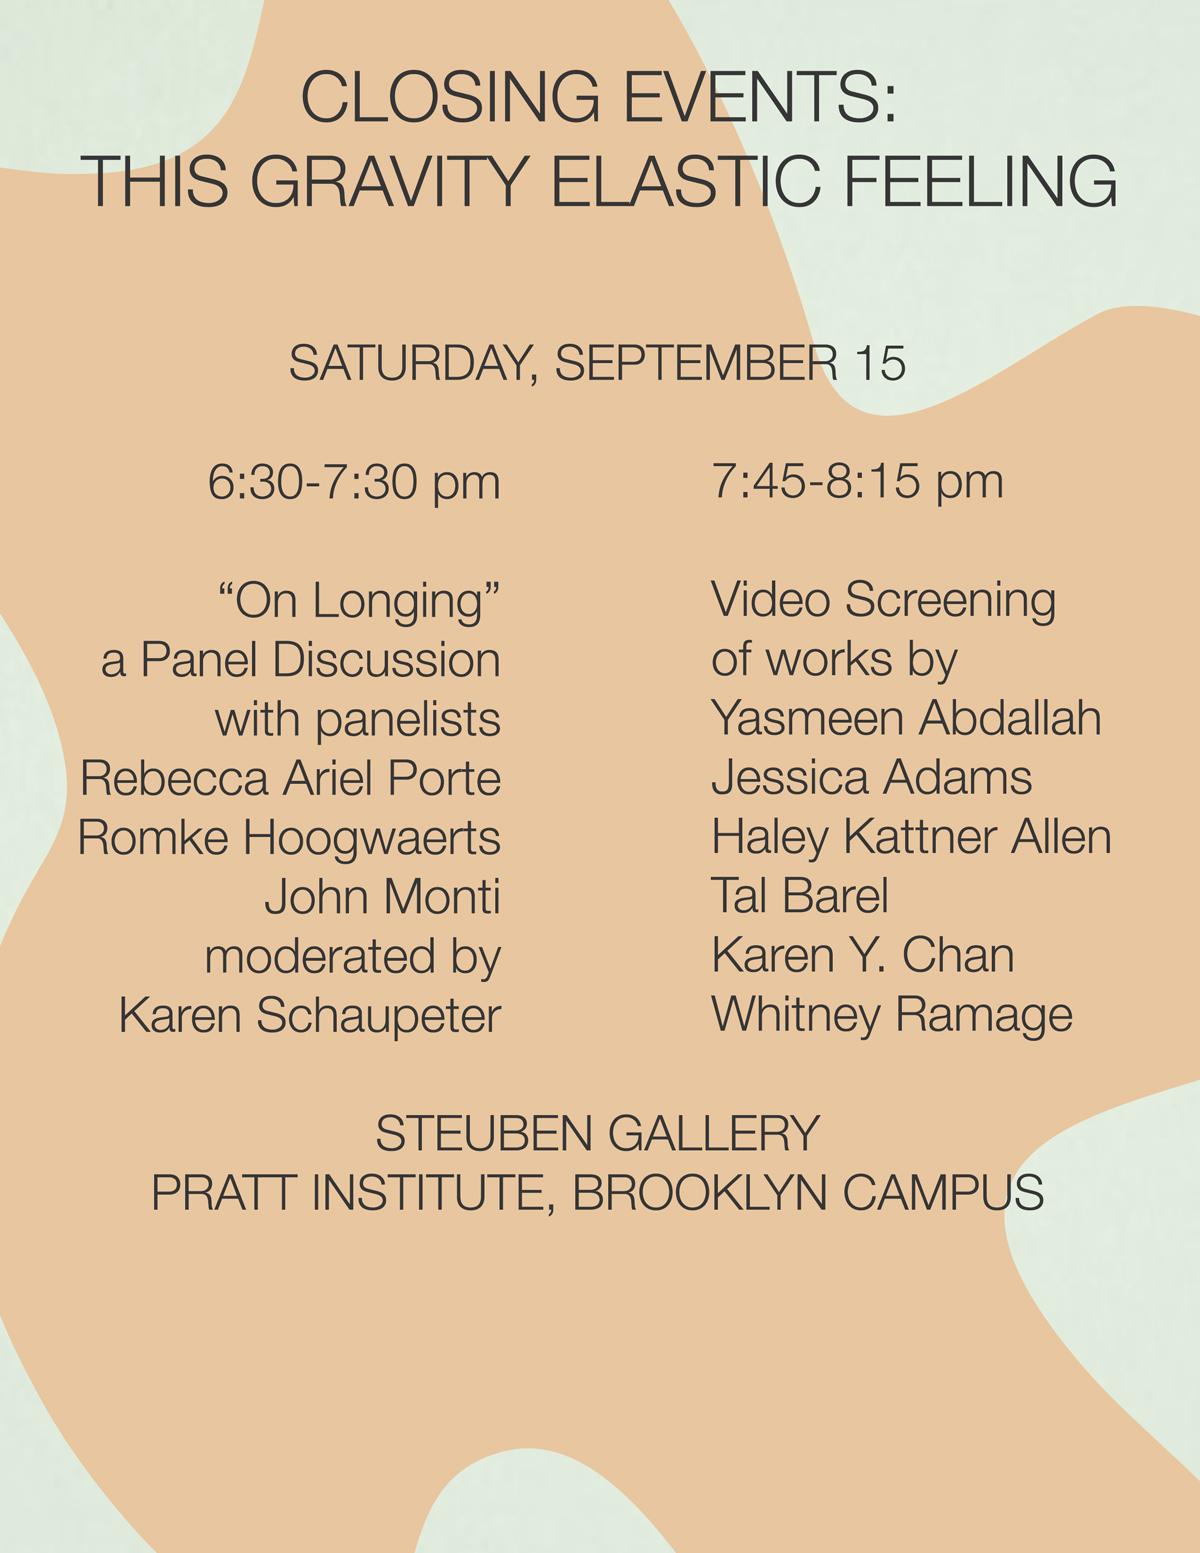 This-Gravity-Elastic-Feeling-Events-web.jpg